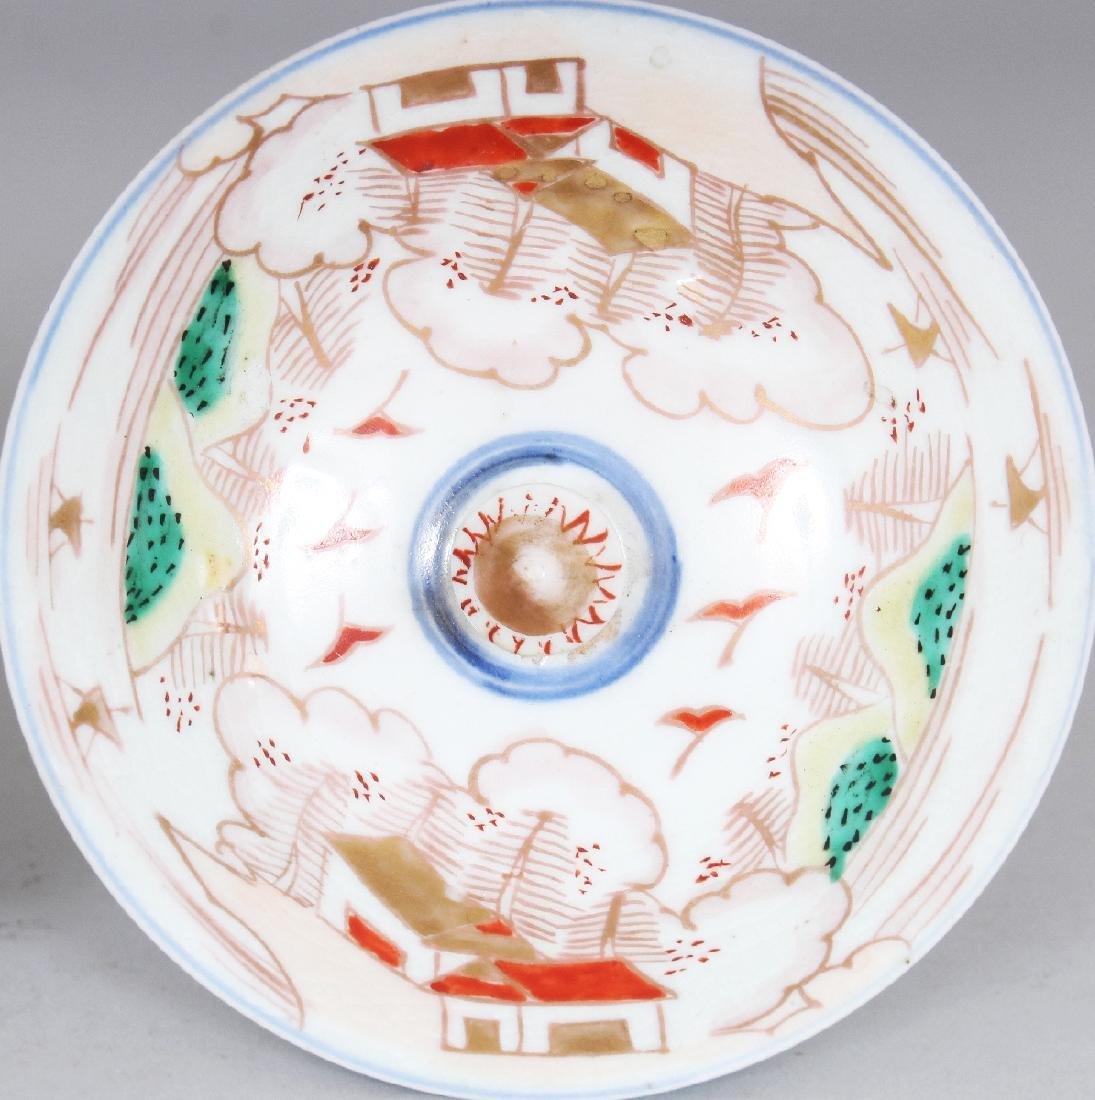 AN 18TH/19TH CENTURY JAPANESE IMARI PORCELAIN BOWL & - 4